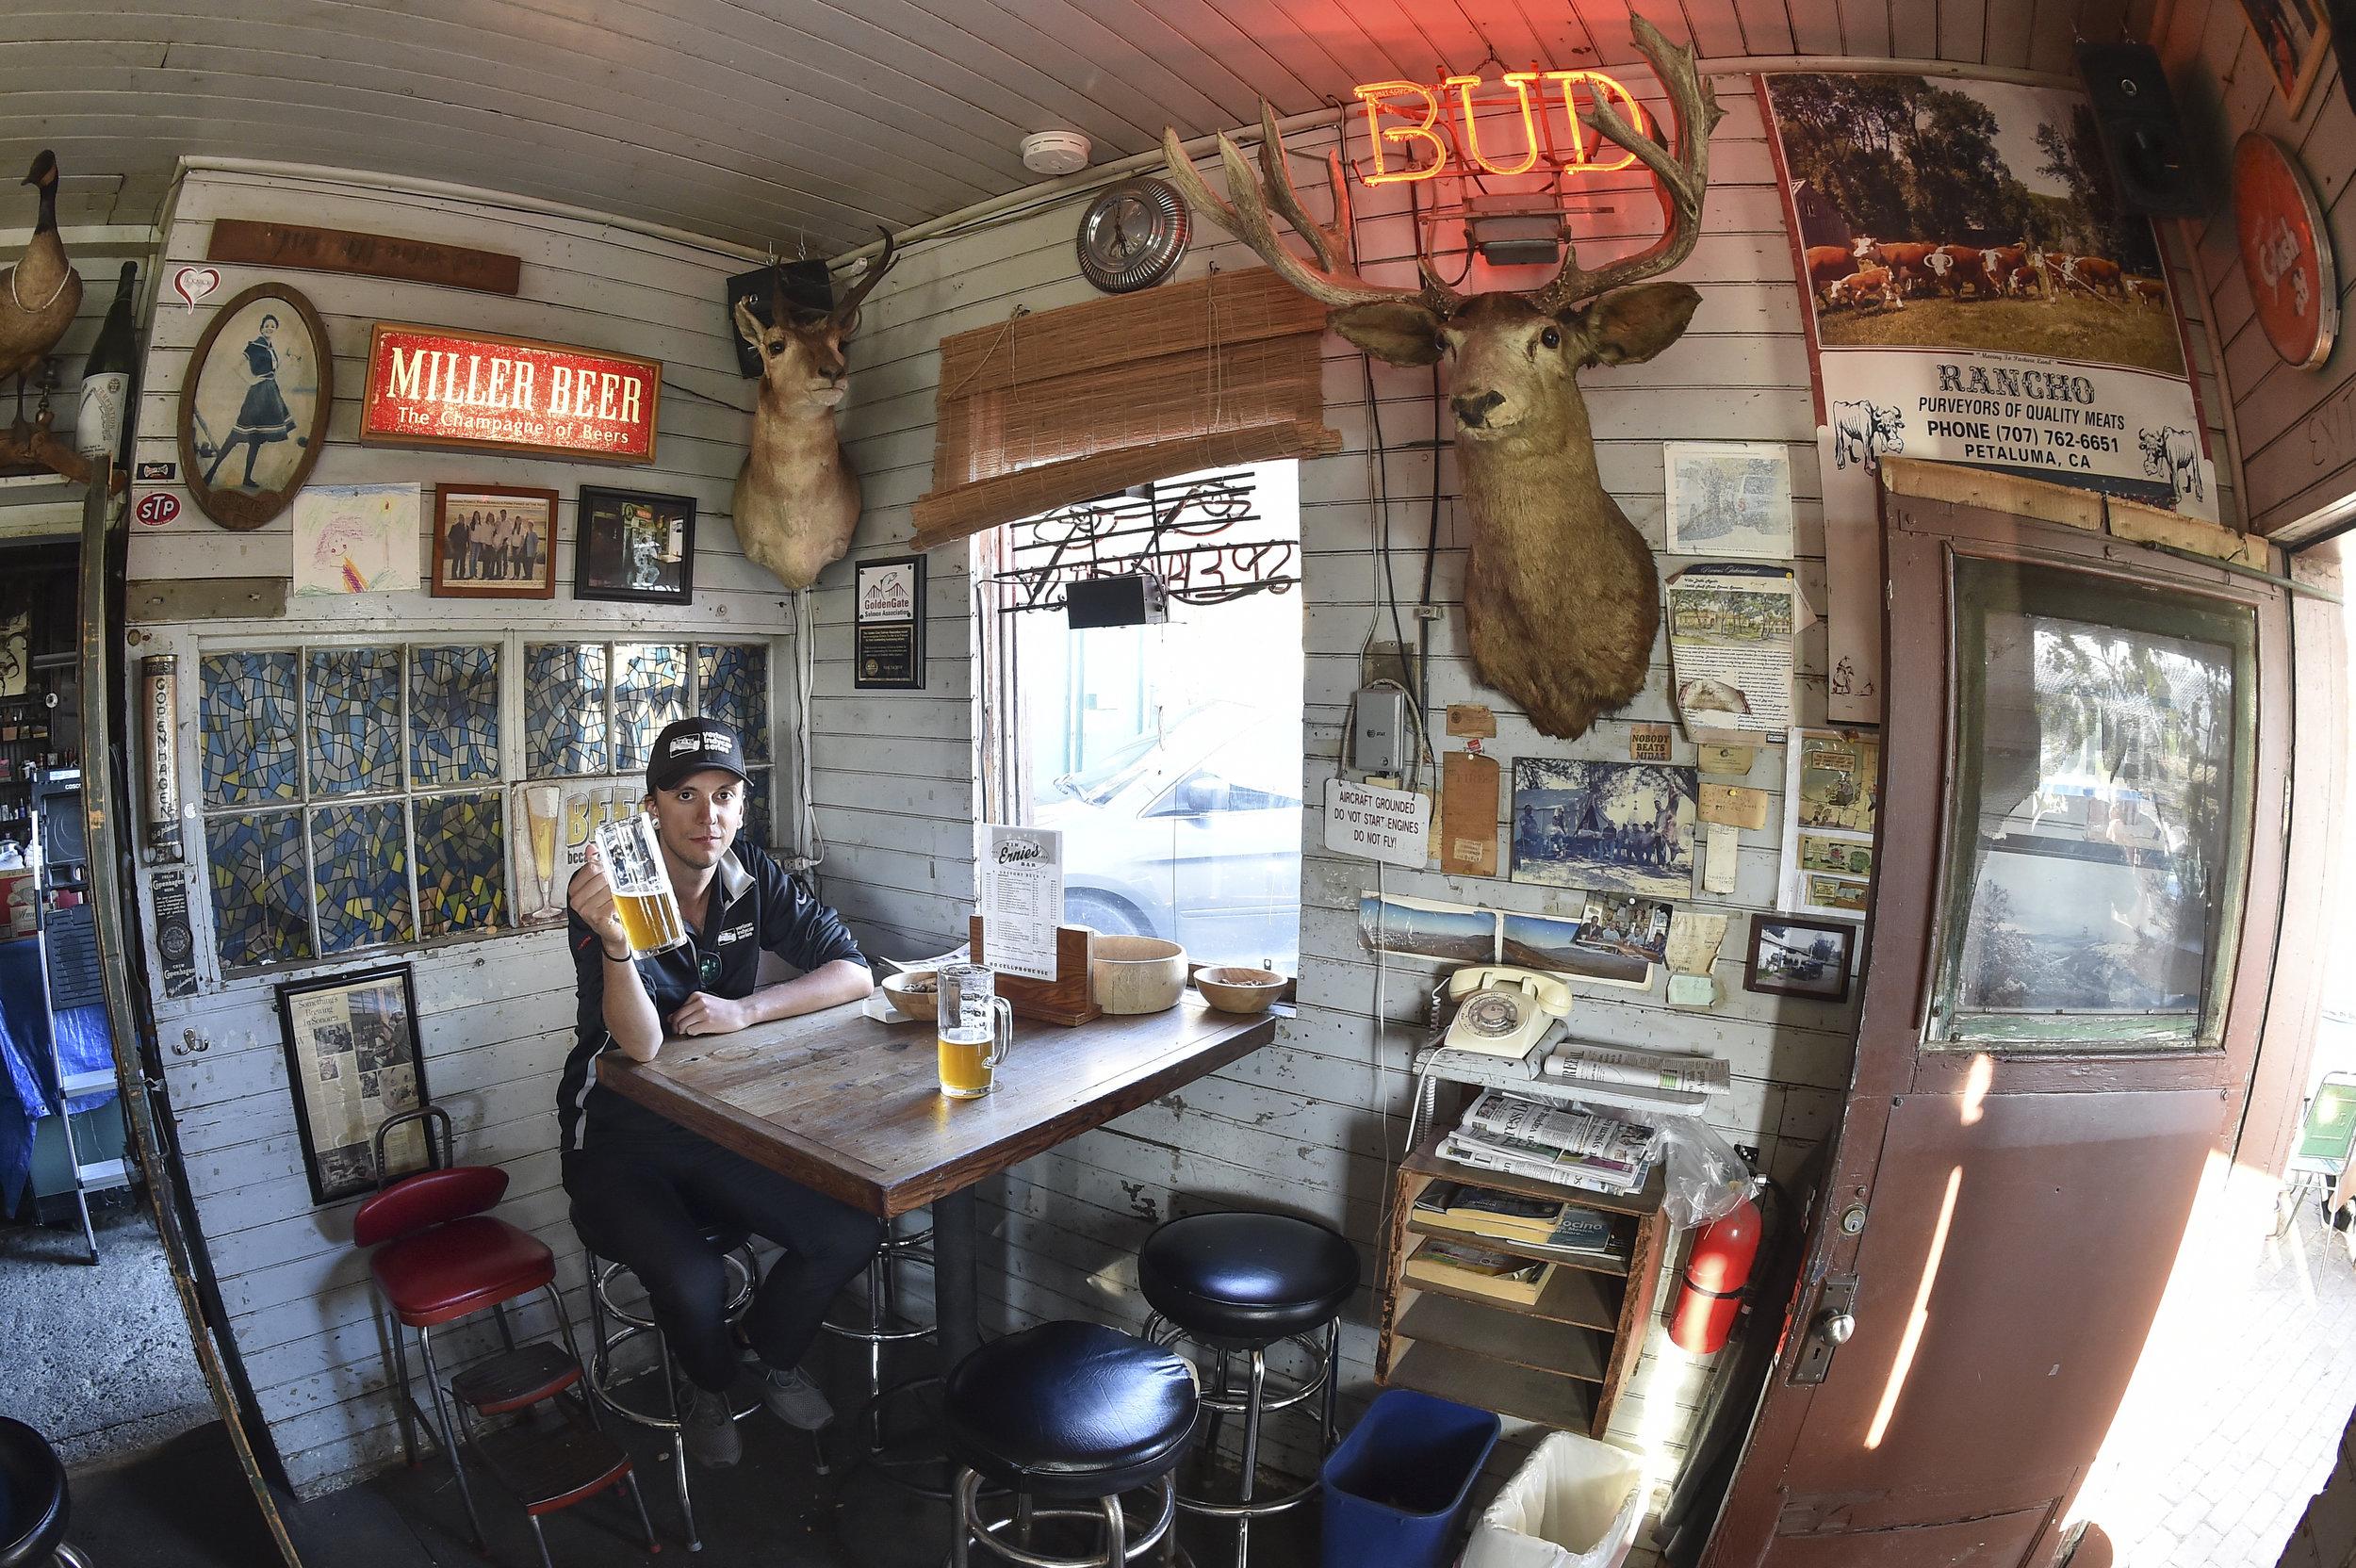 Joe at Ernie's Tin Bar - Sonoma, CA - Shot with Nikon D4S